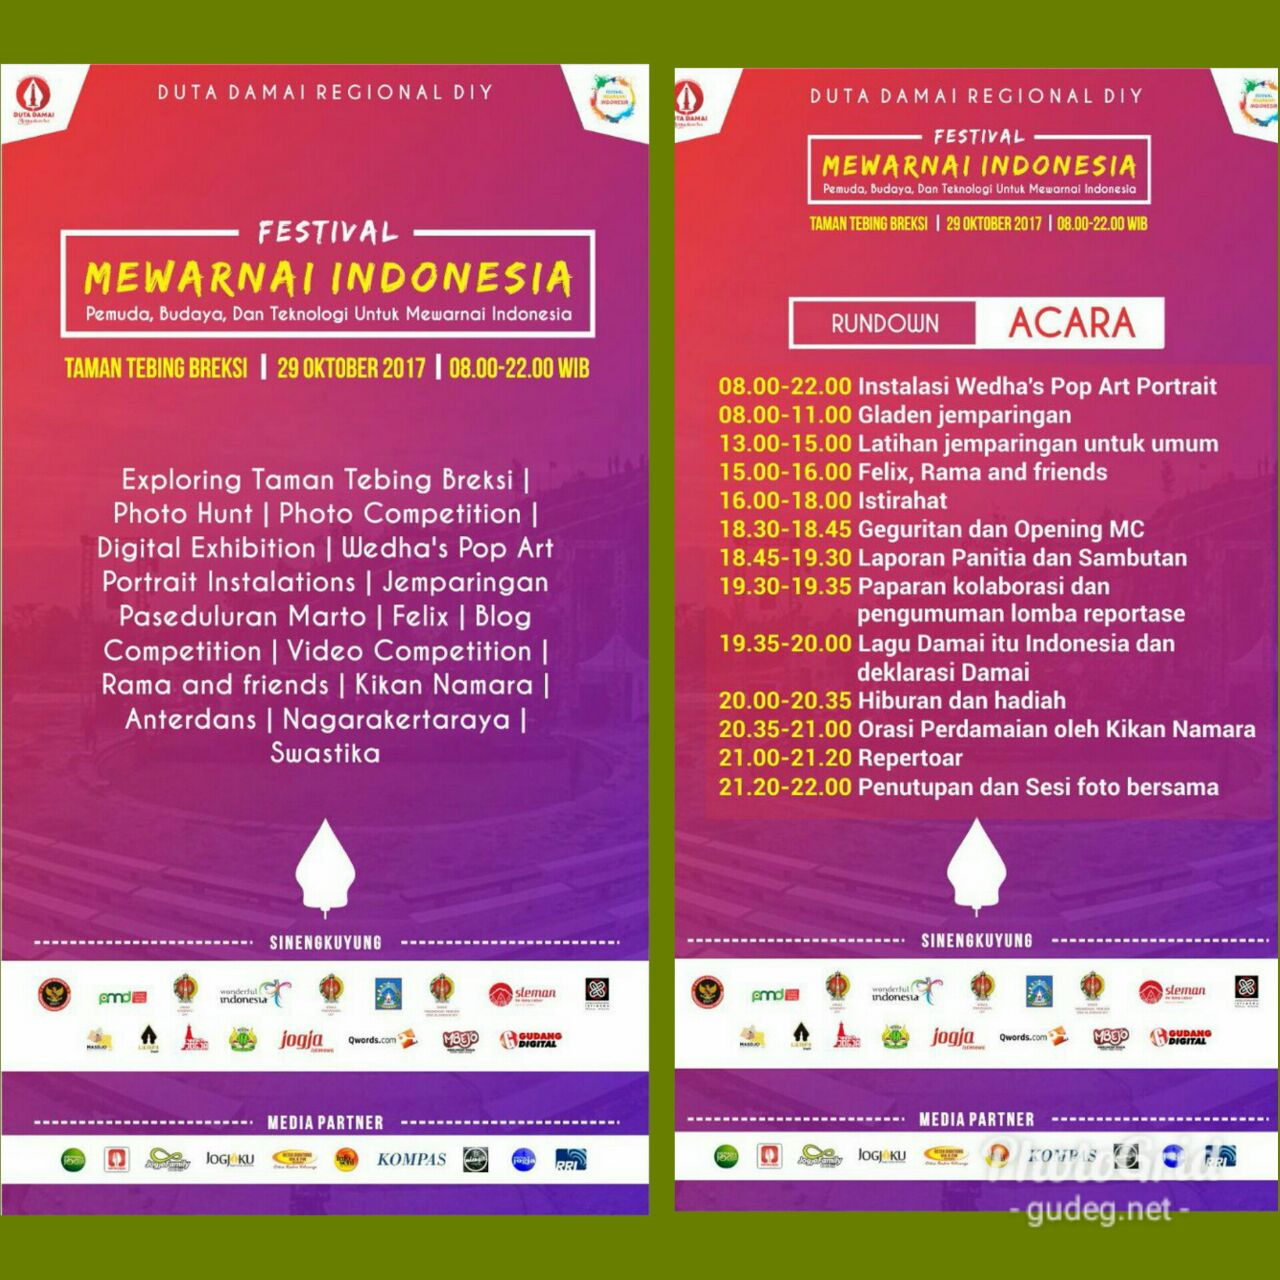 Festival Mewarnai Indonesia Minggu 29 Oktober 2017 Pkl 08 00 22 00 WIB